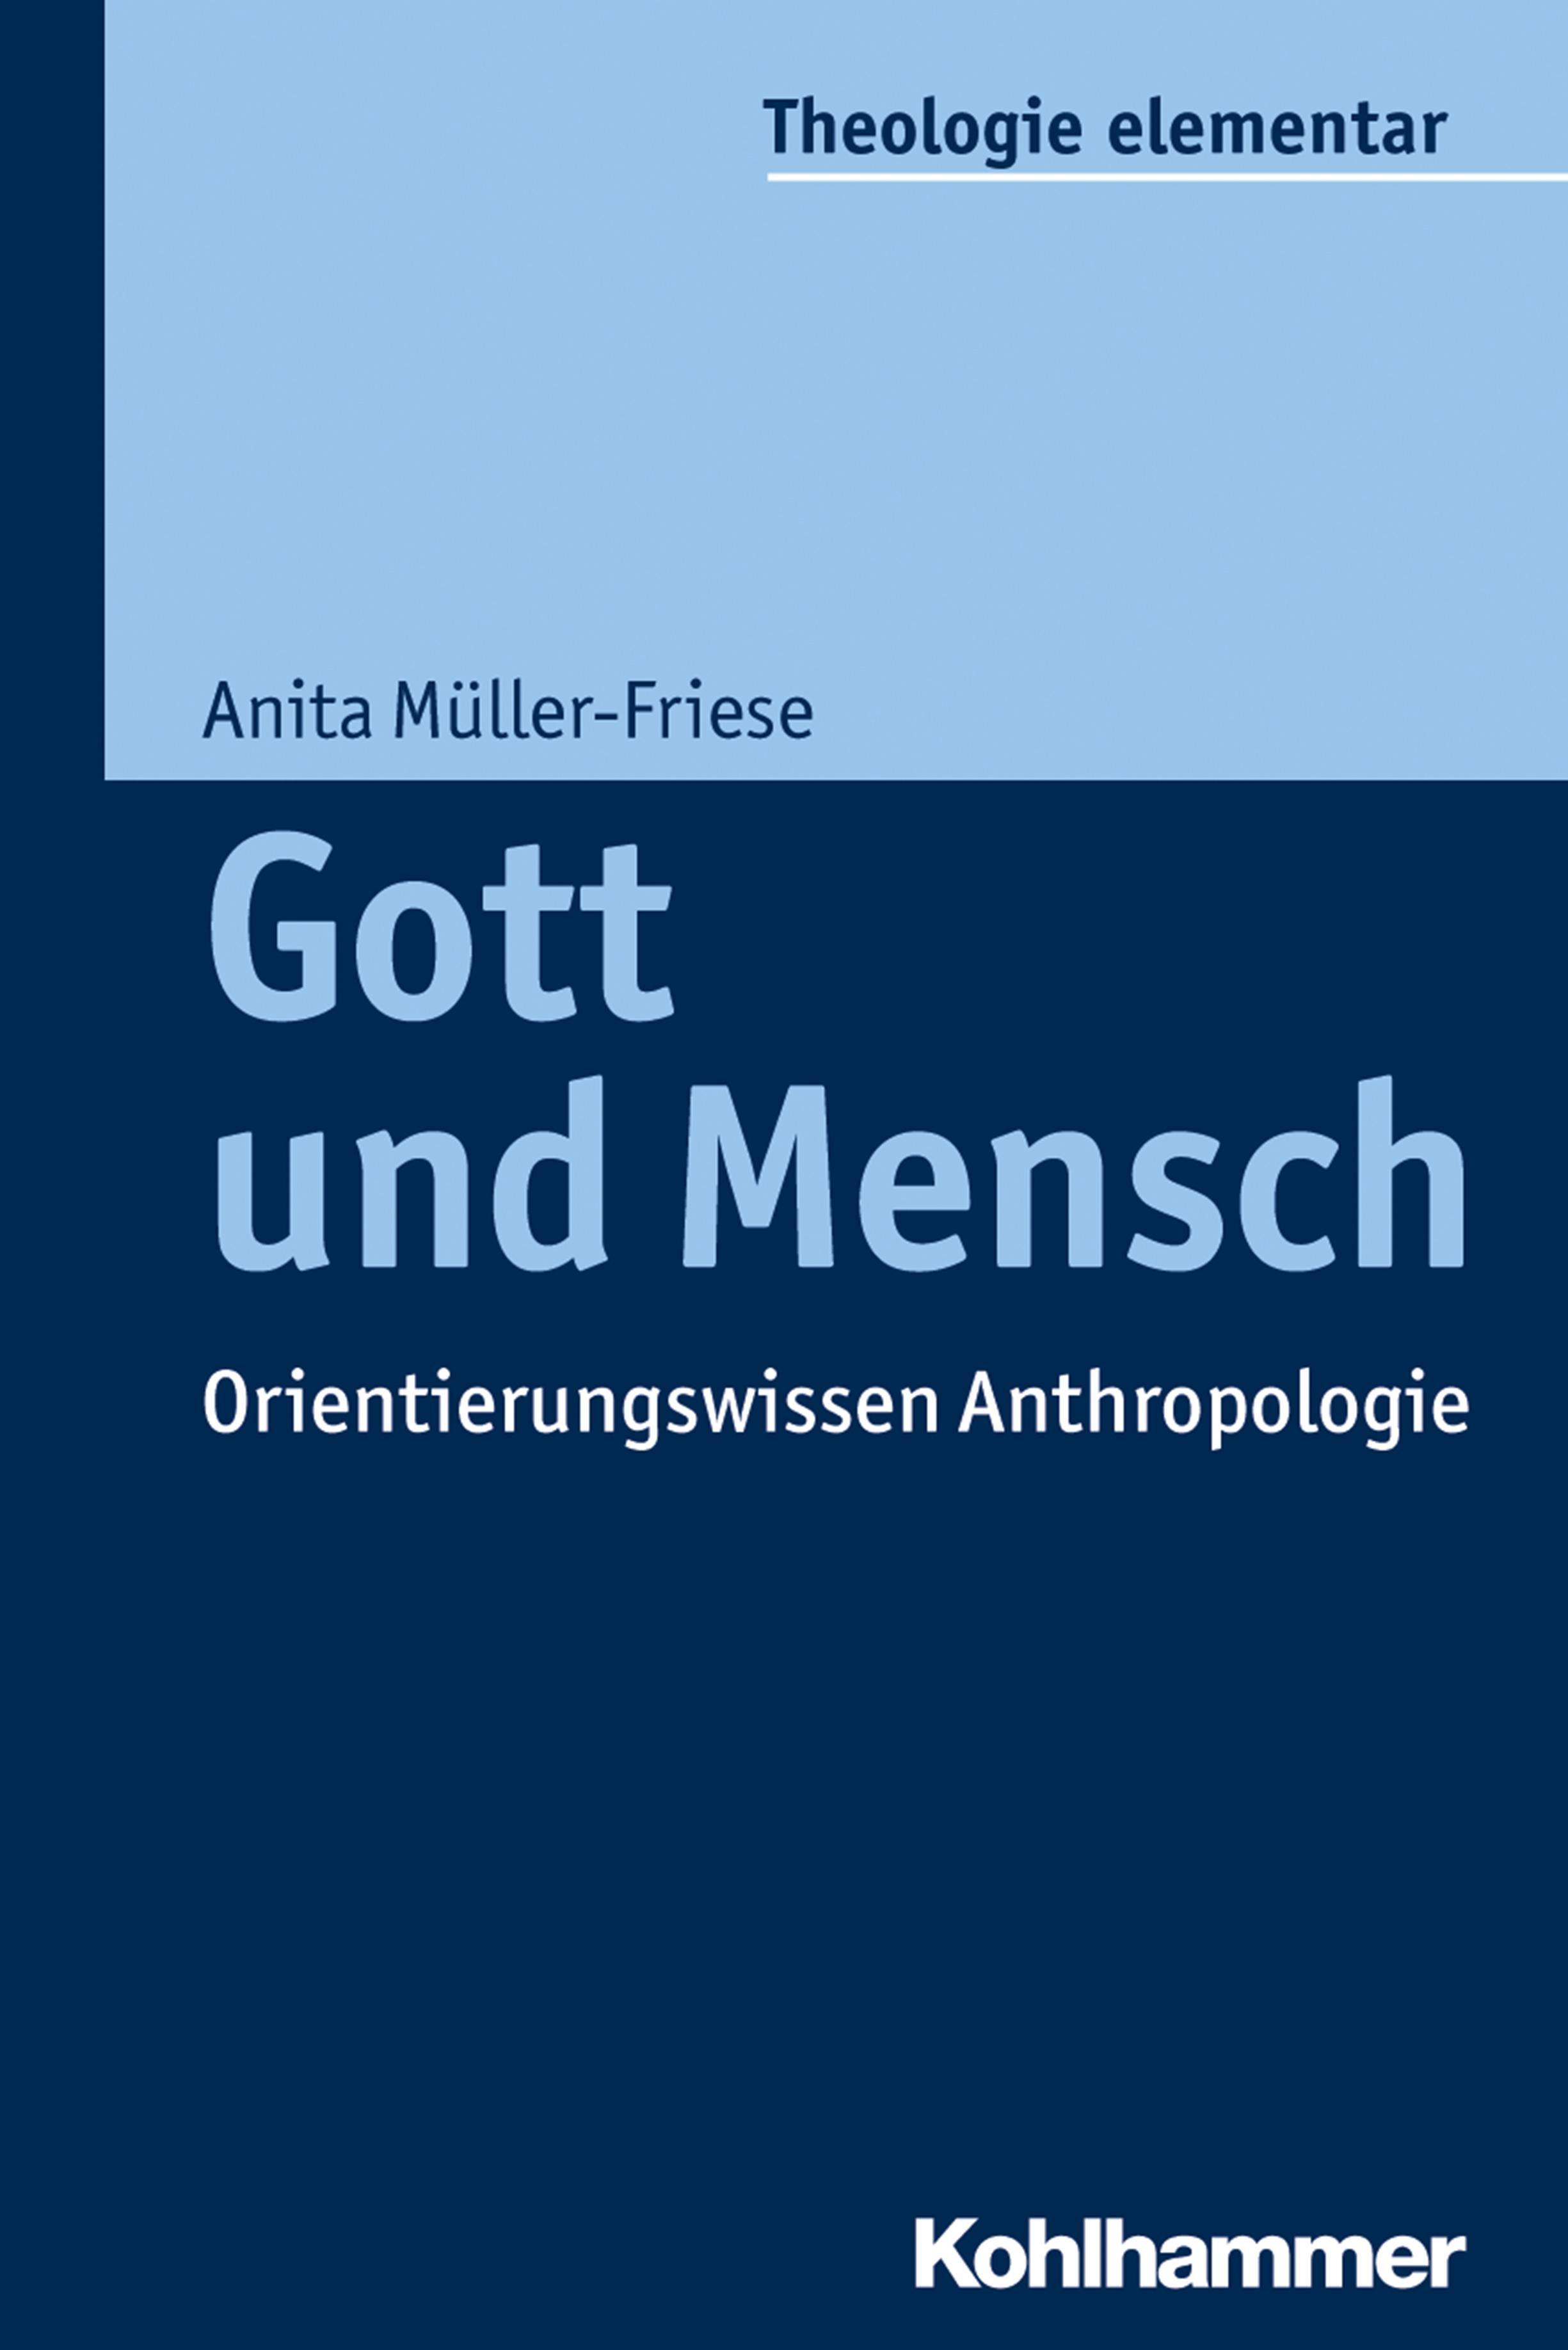 Anita Müller-Friese Gott und Mensch bi 6187 181a r1k tapped conductive plastic potentiometer 4p